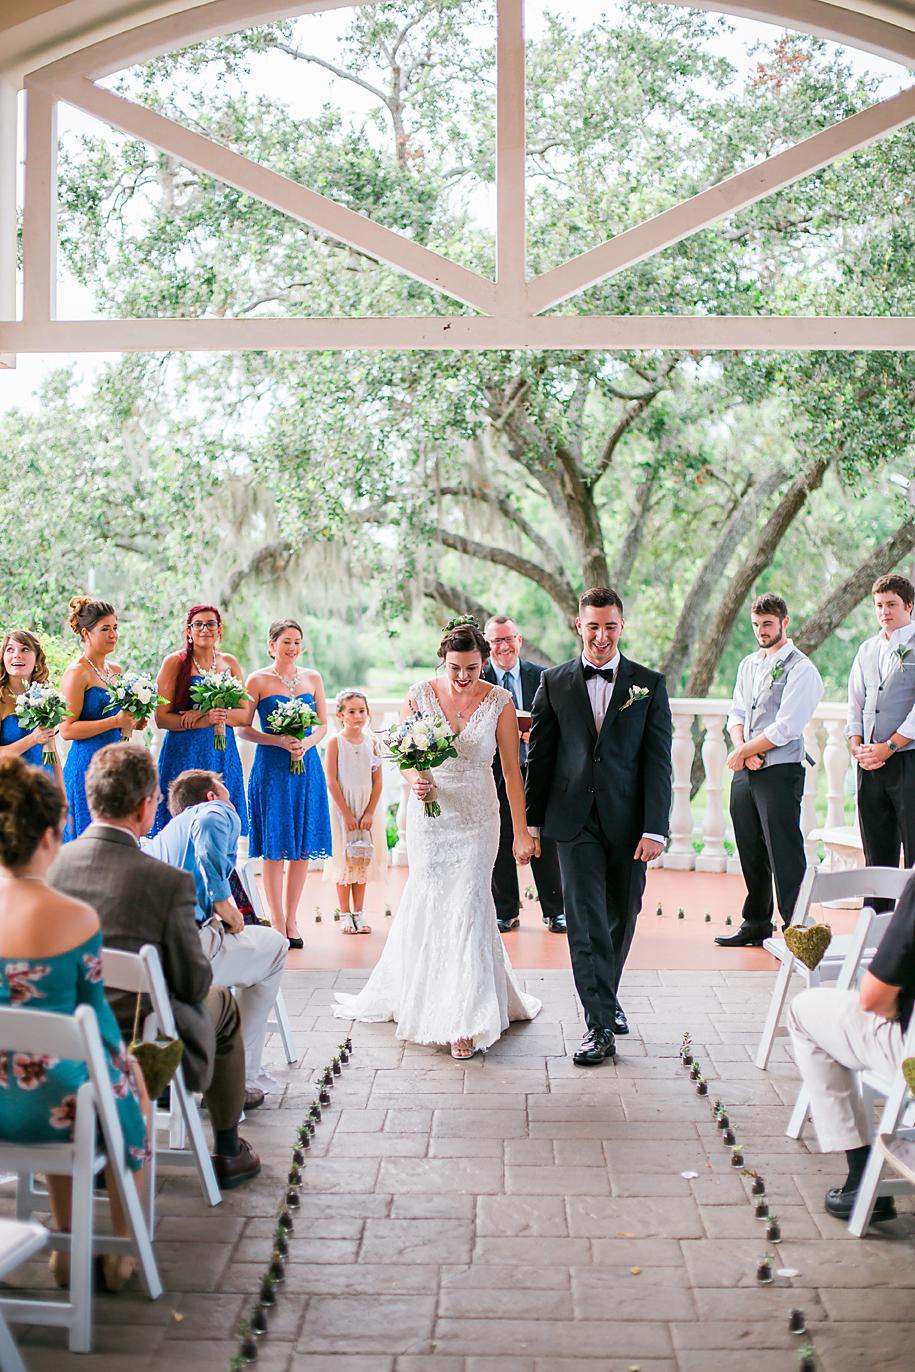 Kayla + Jesse - Tampa Wedding Photography - East Lake Woodland's Country Club Wedding Photographer - Emily & Co. Photography  (31).jpg